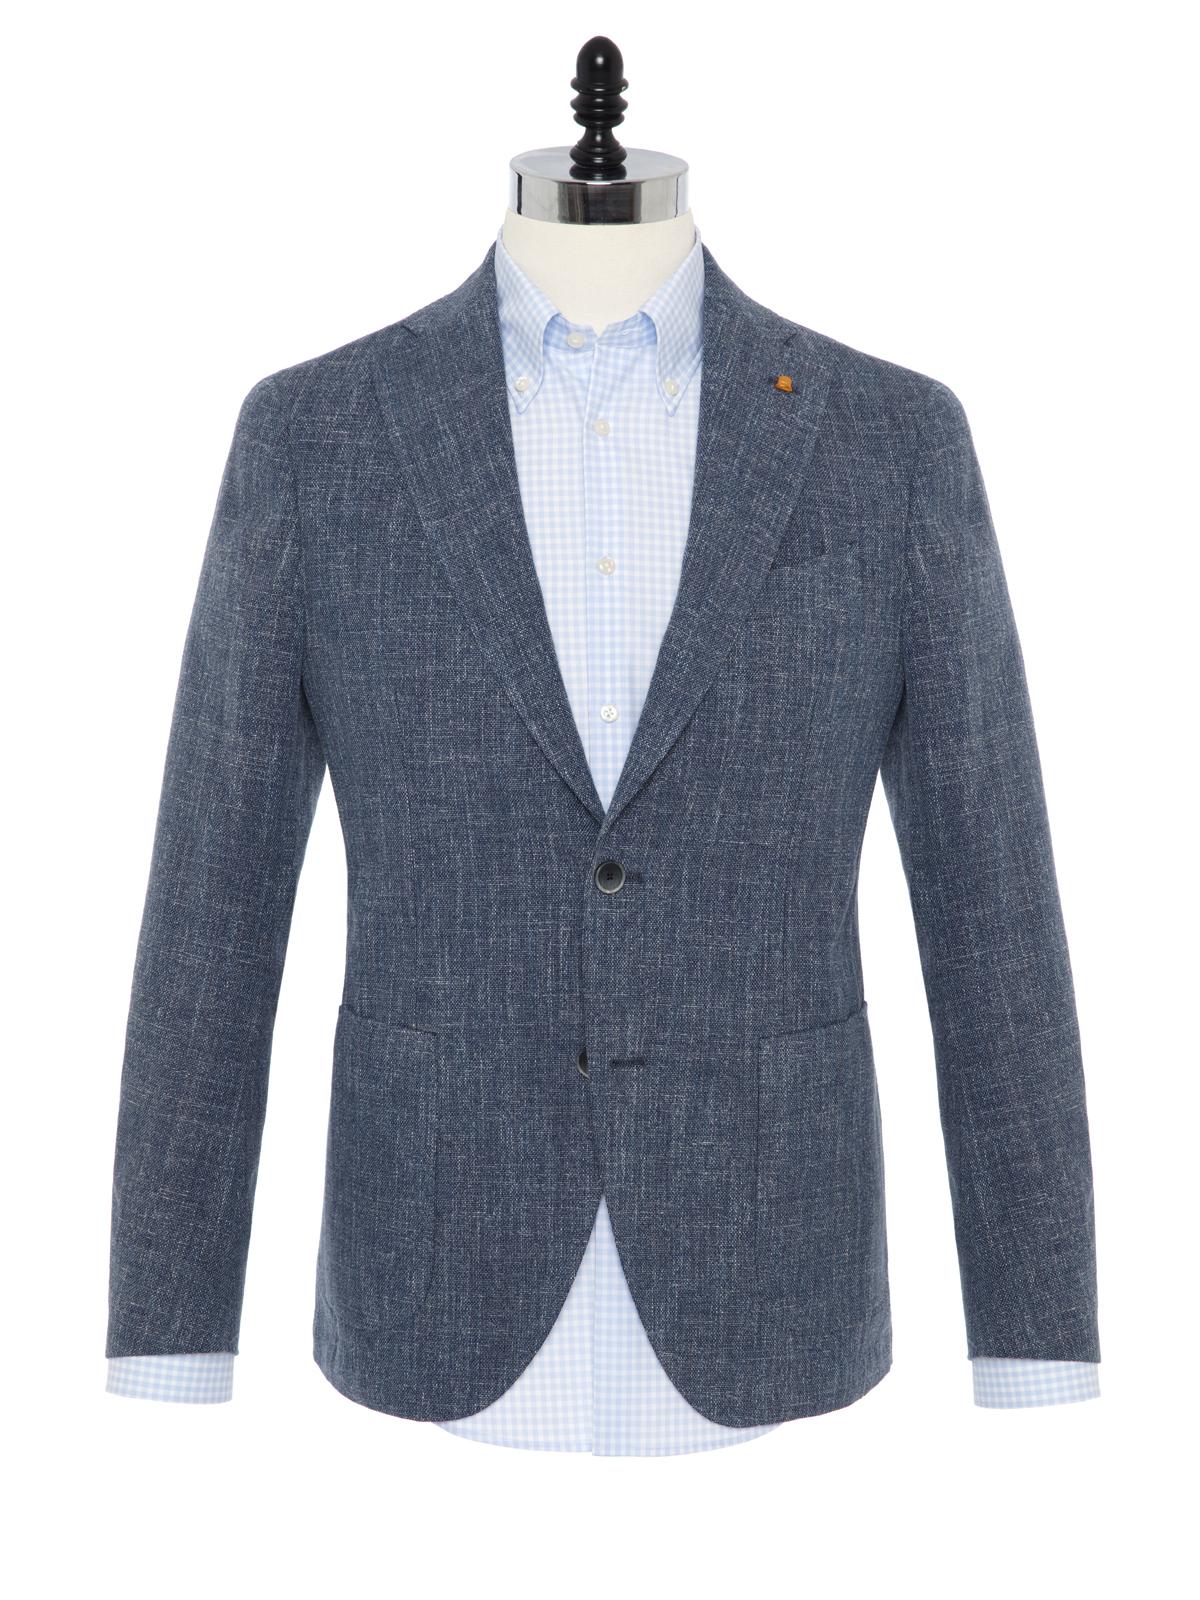 Sartoria Latorre - Sartoria Latorre Blue Navy Melange Unlined Jacket